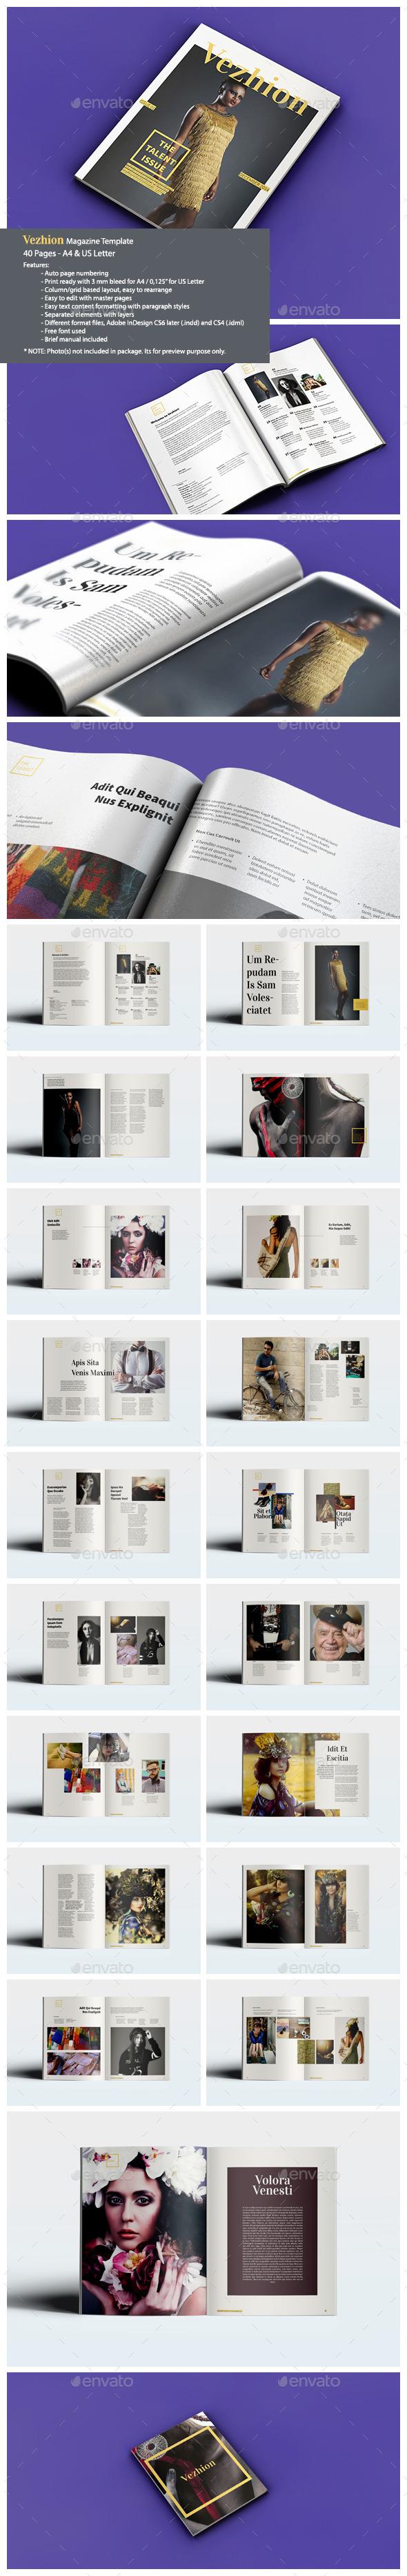 Vezhion Magazine - Magazines Print Templates